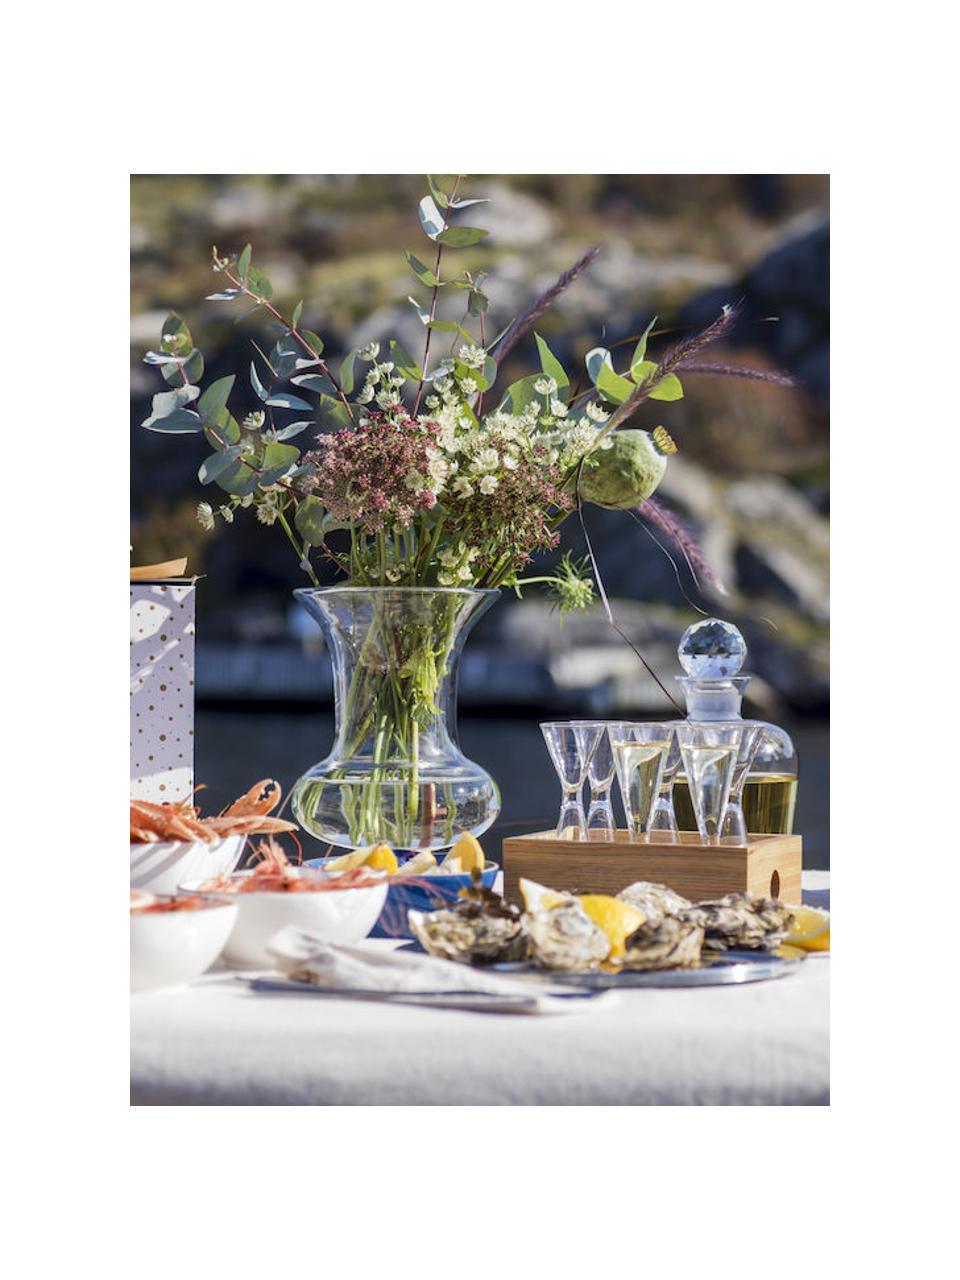 Mundgeblasene Schnapsgläser Semon mit Holzbox, 6 Stück, Mundgeblasenes Glas, Eichenholz, Transparent, Eichenholz, Ø 4 x H 12 cm